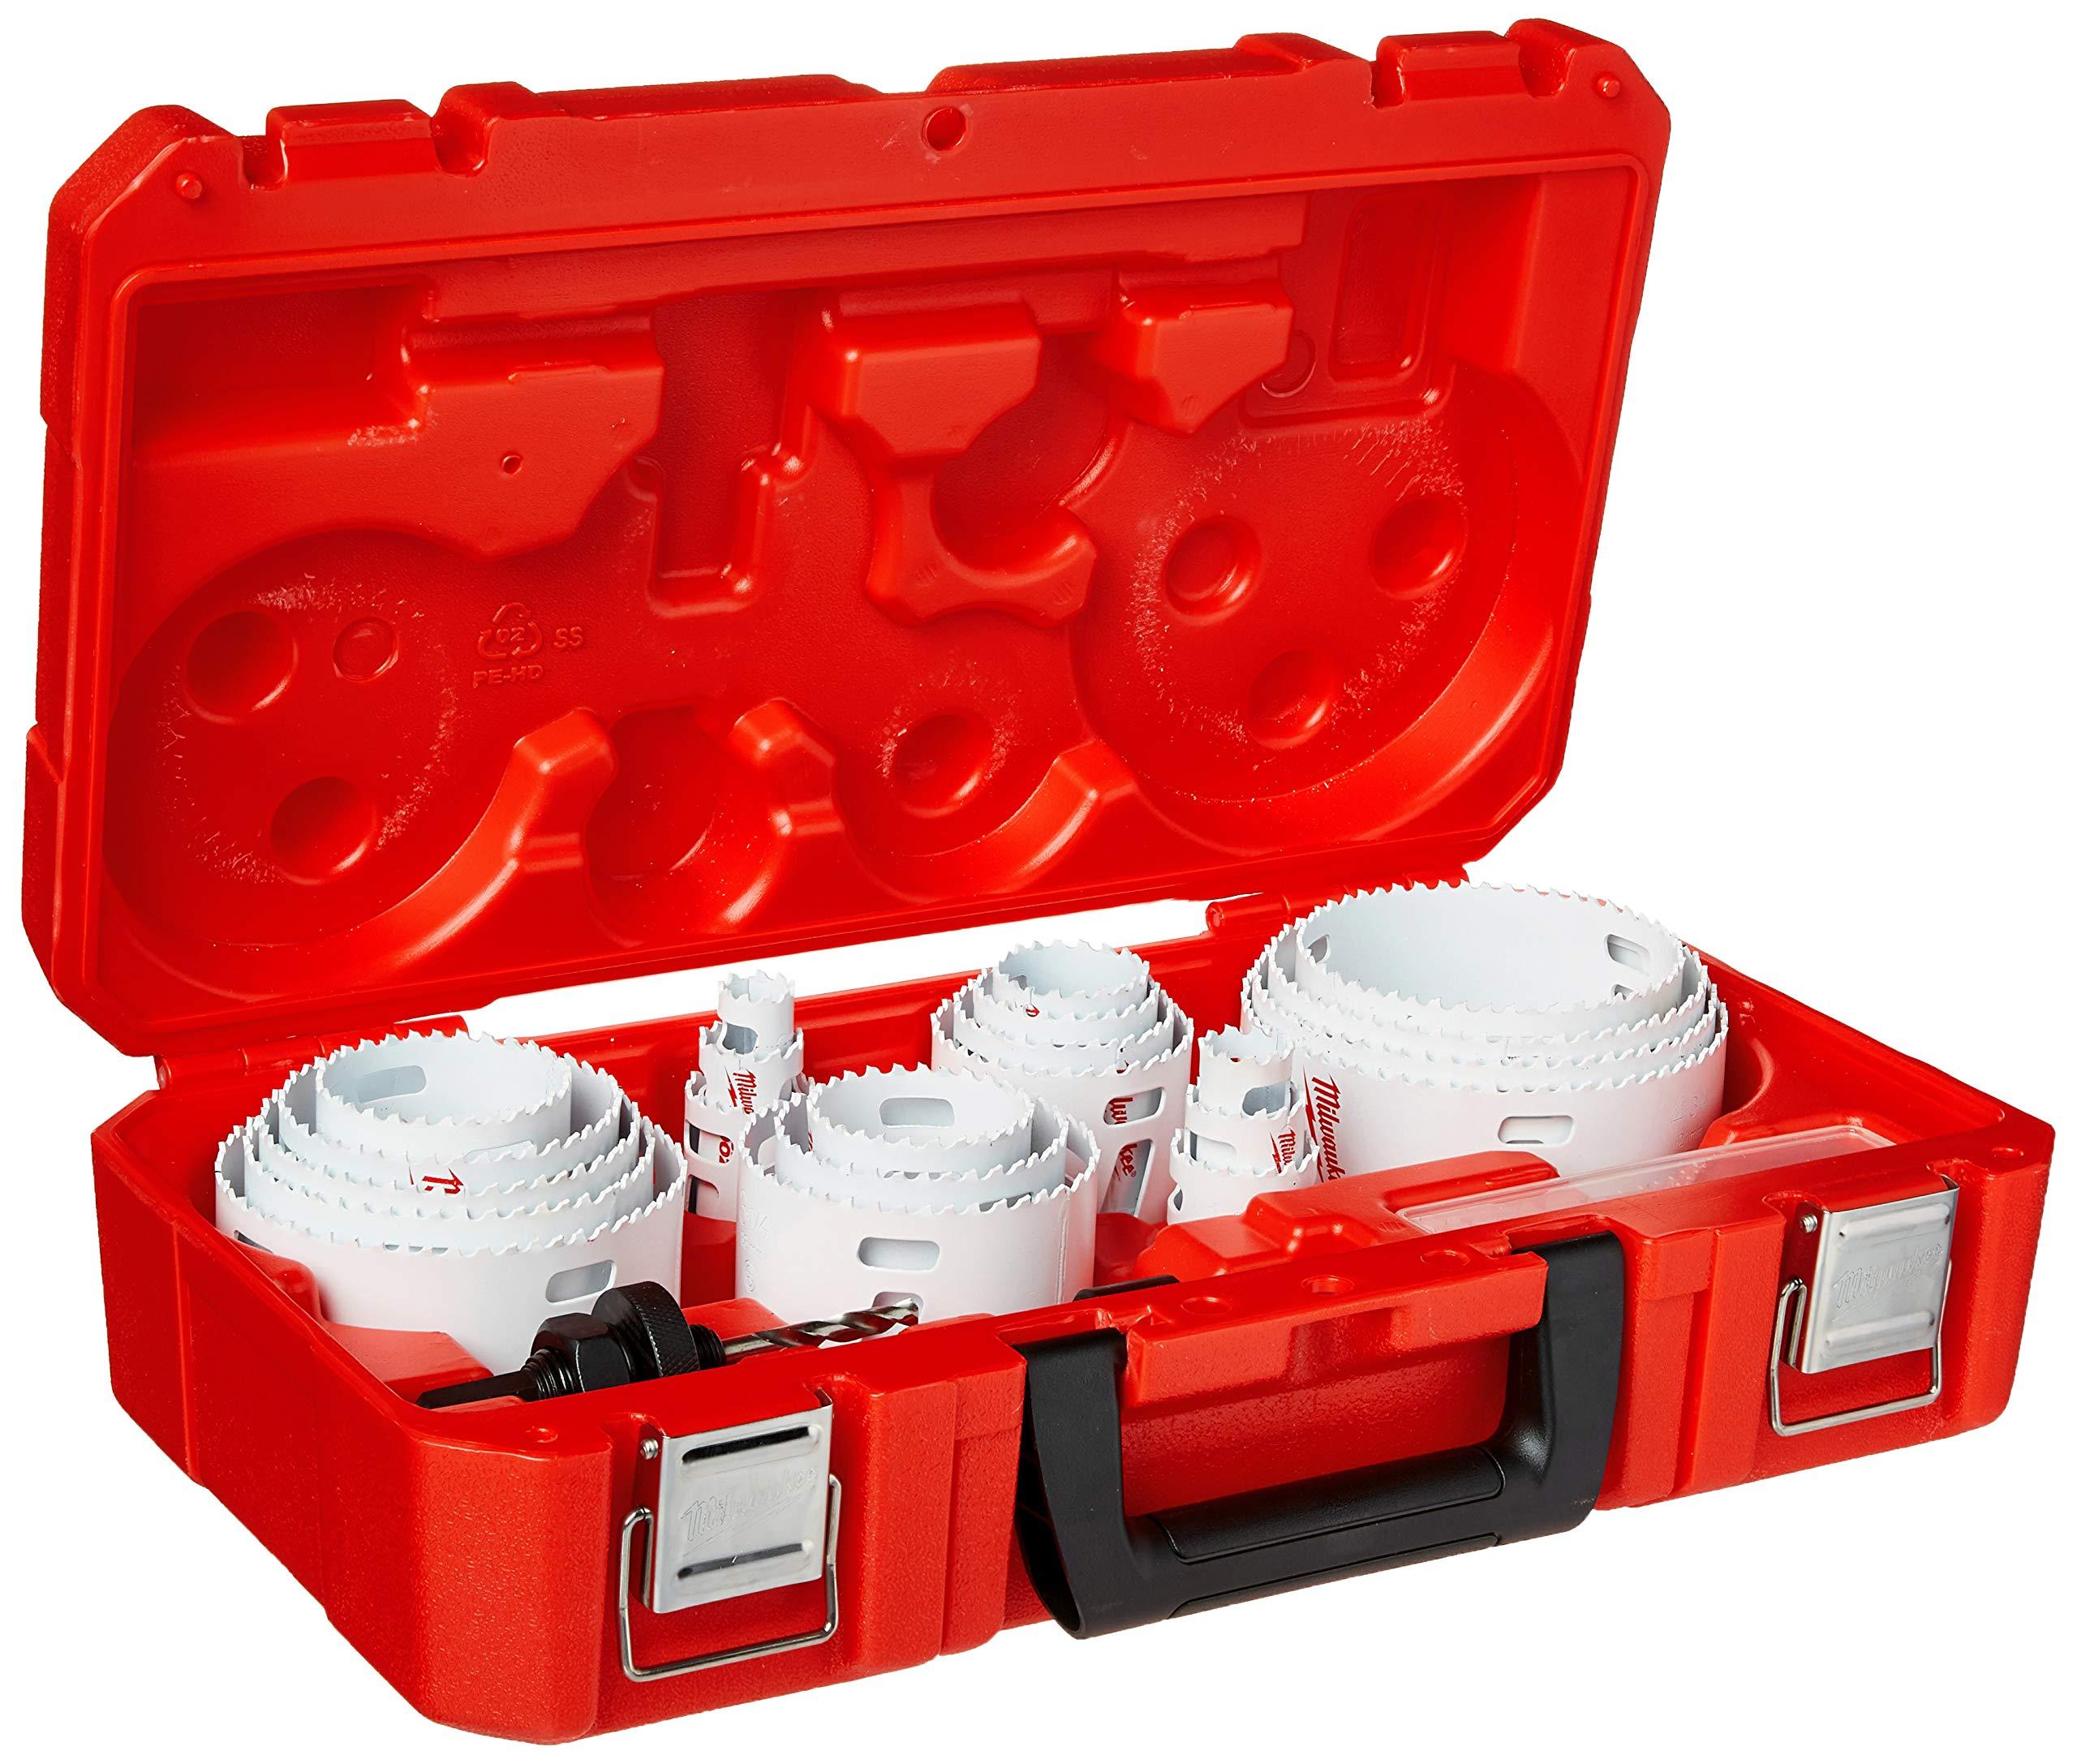 Milwaukee 49-22-4185 28-Piece All Purpose Professional Ice Hardened Hole Saw Kit by Milwaukee